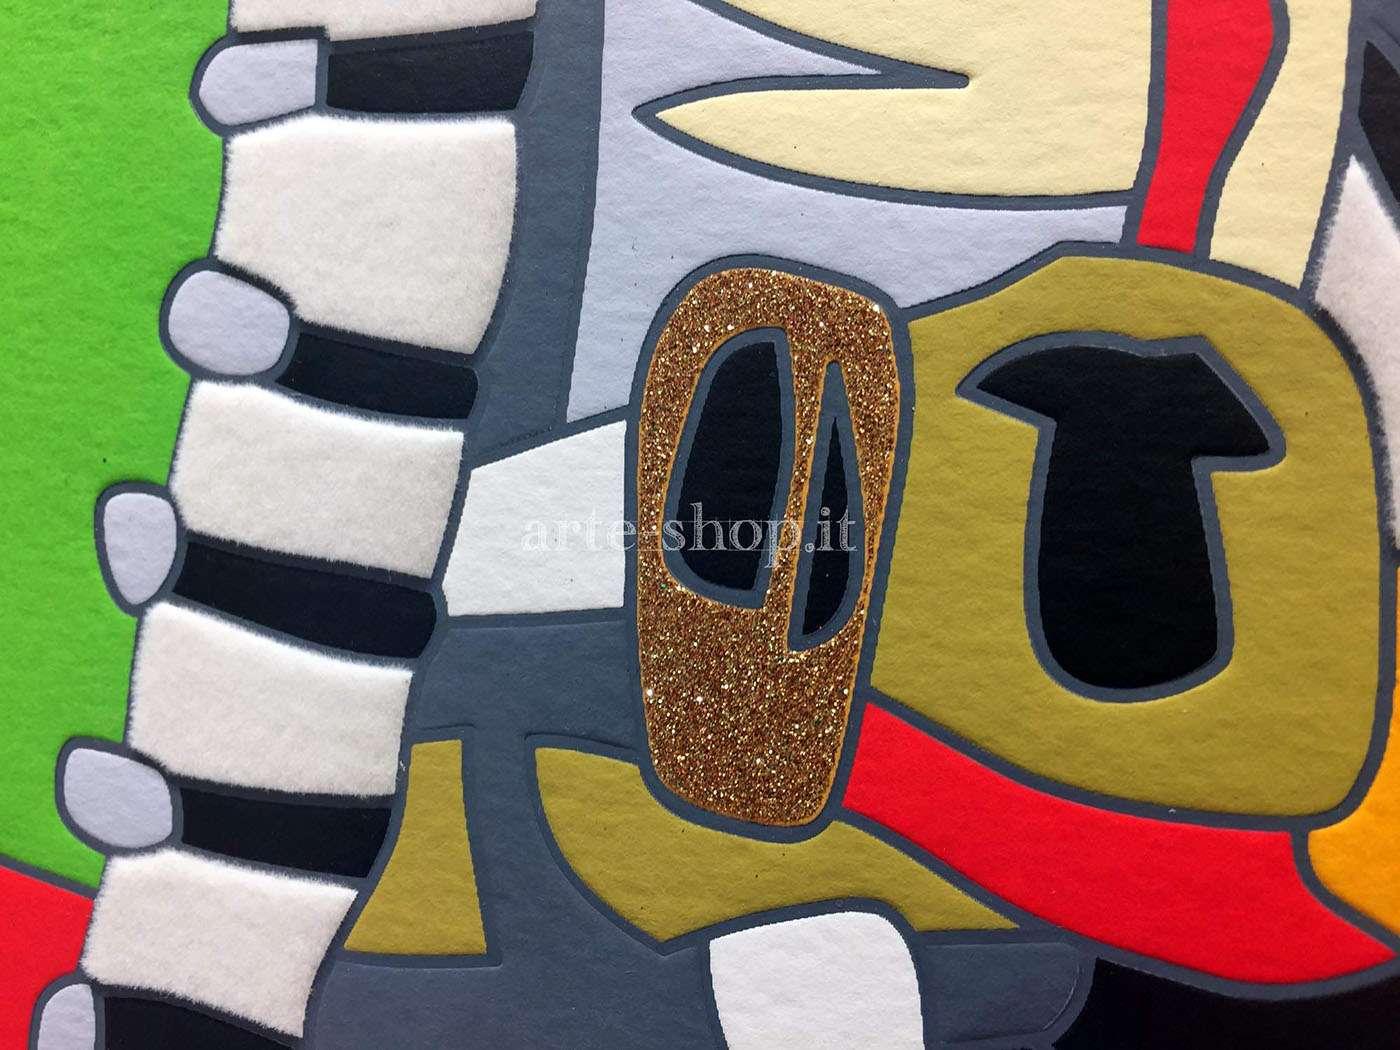 arte pentagono shop dettaglio numero 389